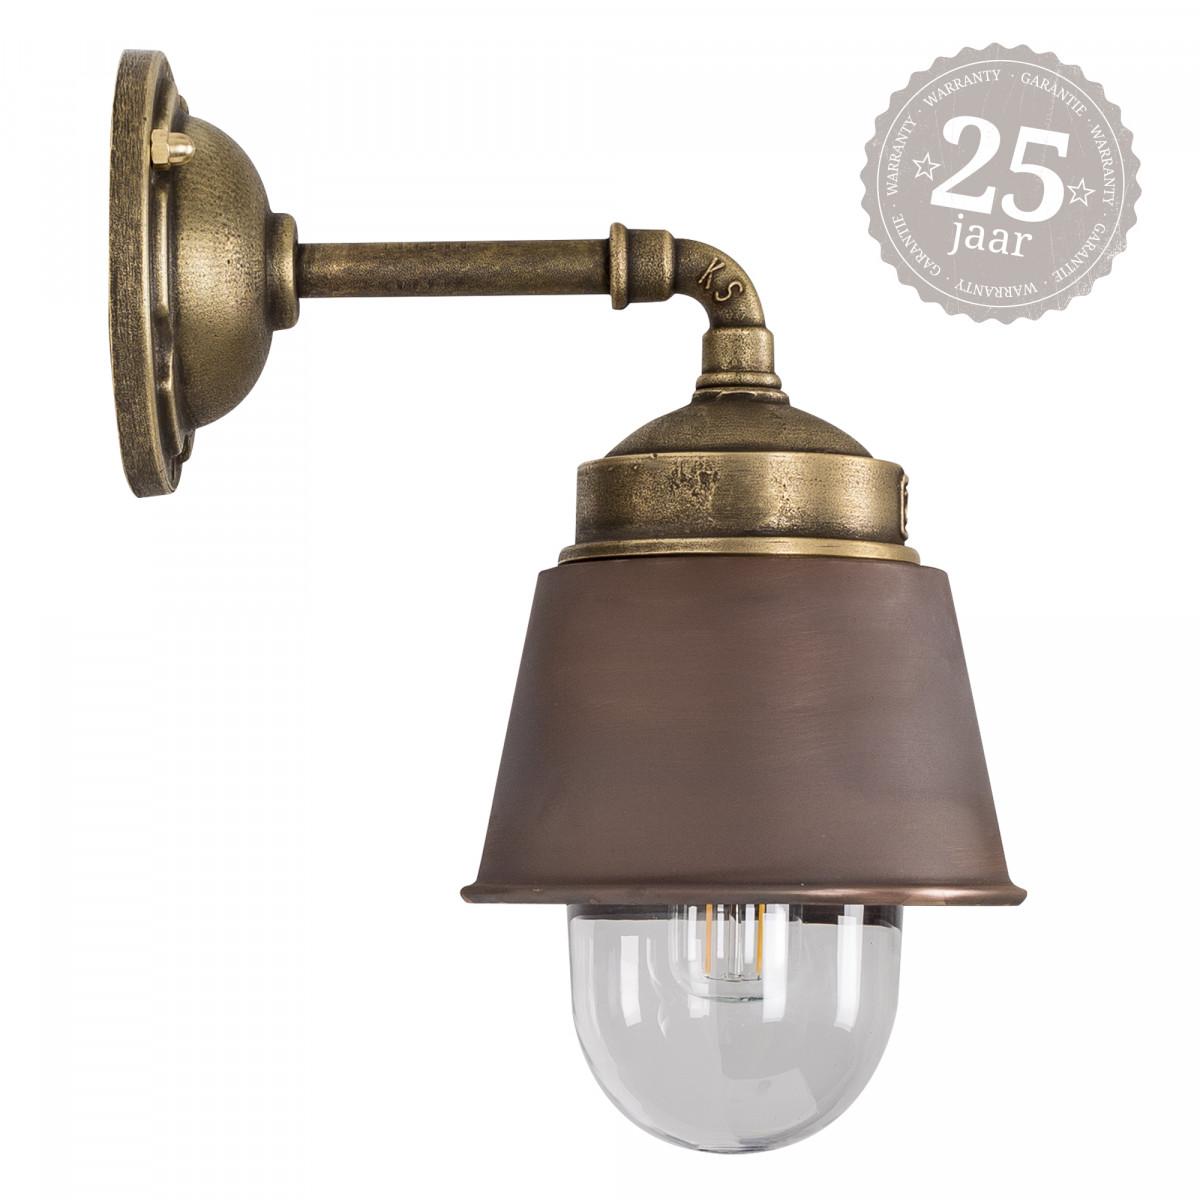 Industriële wandlamp Kostas 90 brons/koper